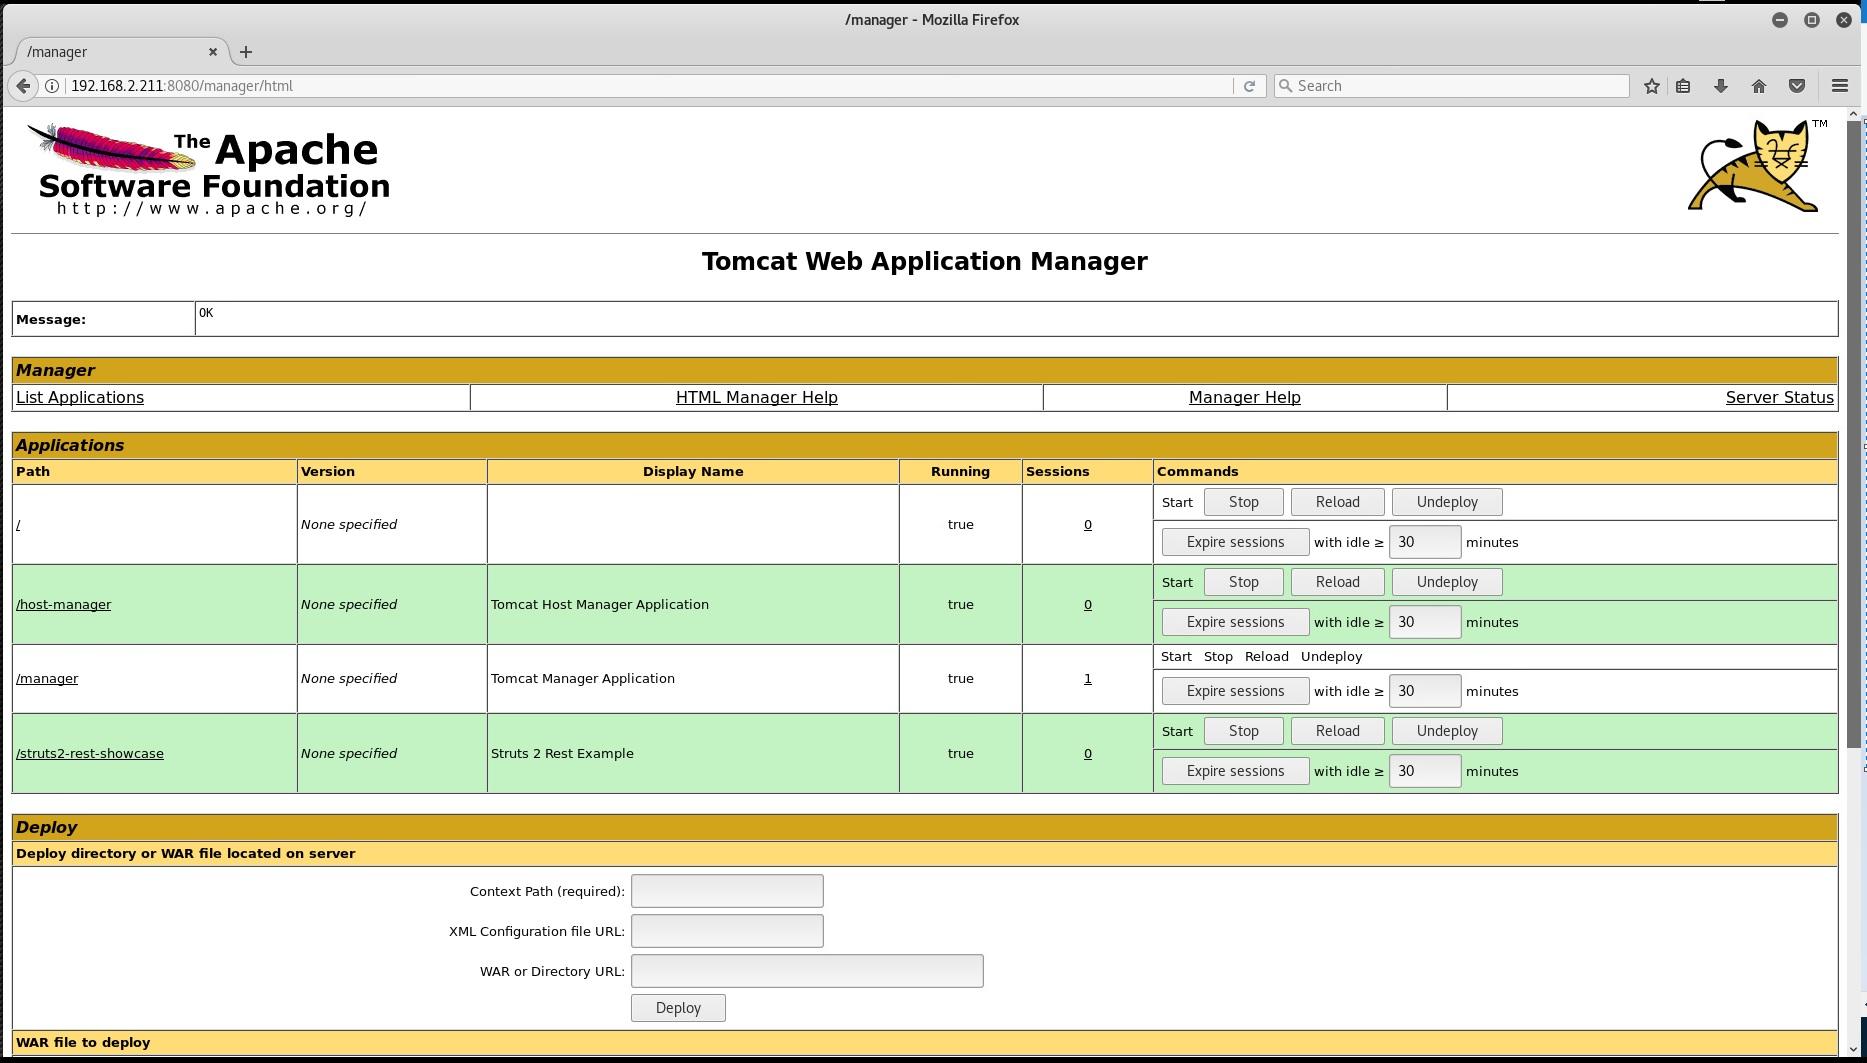 Exploiting Apache Struts - CVE-2017-9805 | RobWillis info